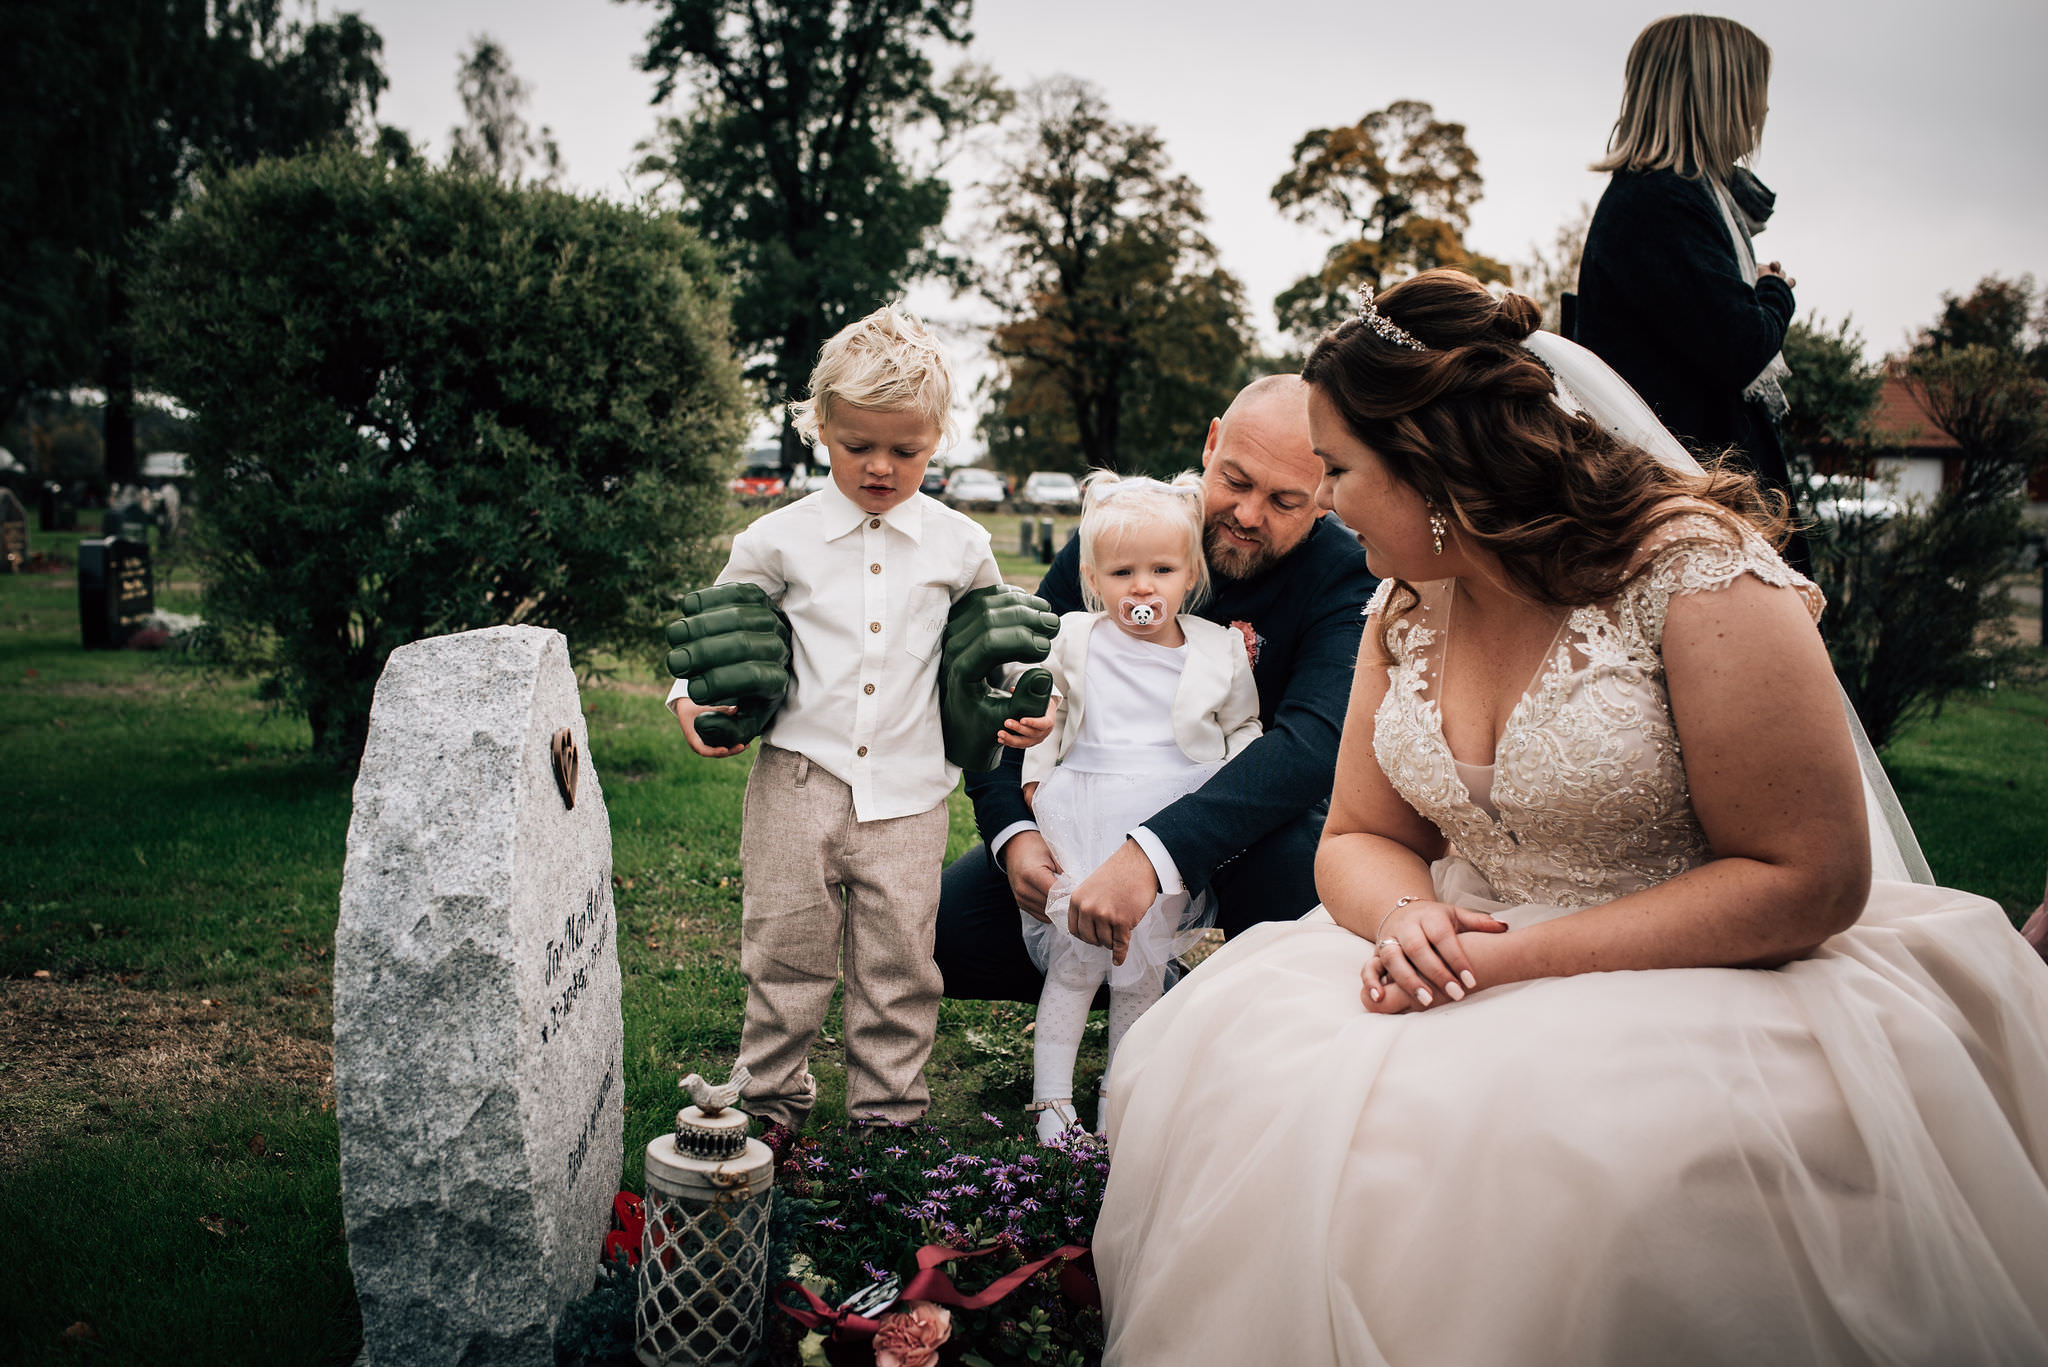 750_9994_fotografering_larvik_bryllup_aspargesgarden_.jpg